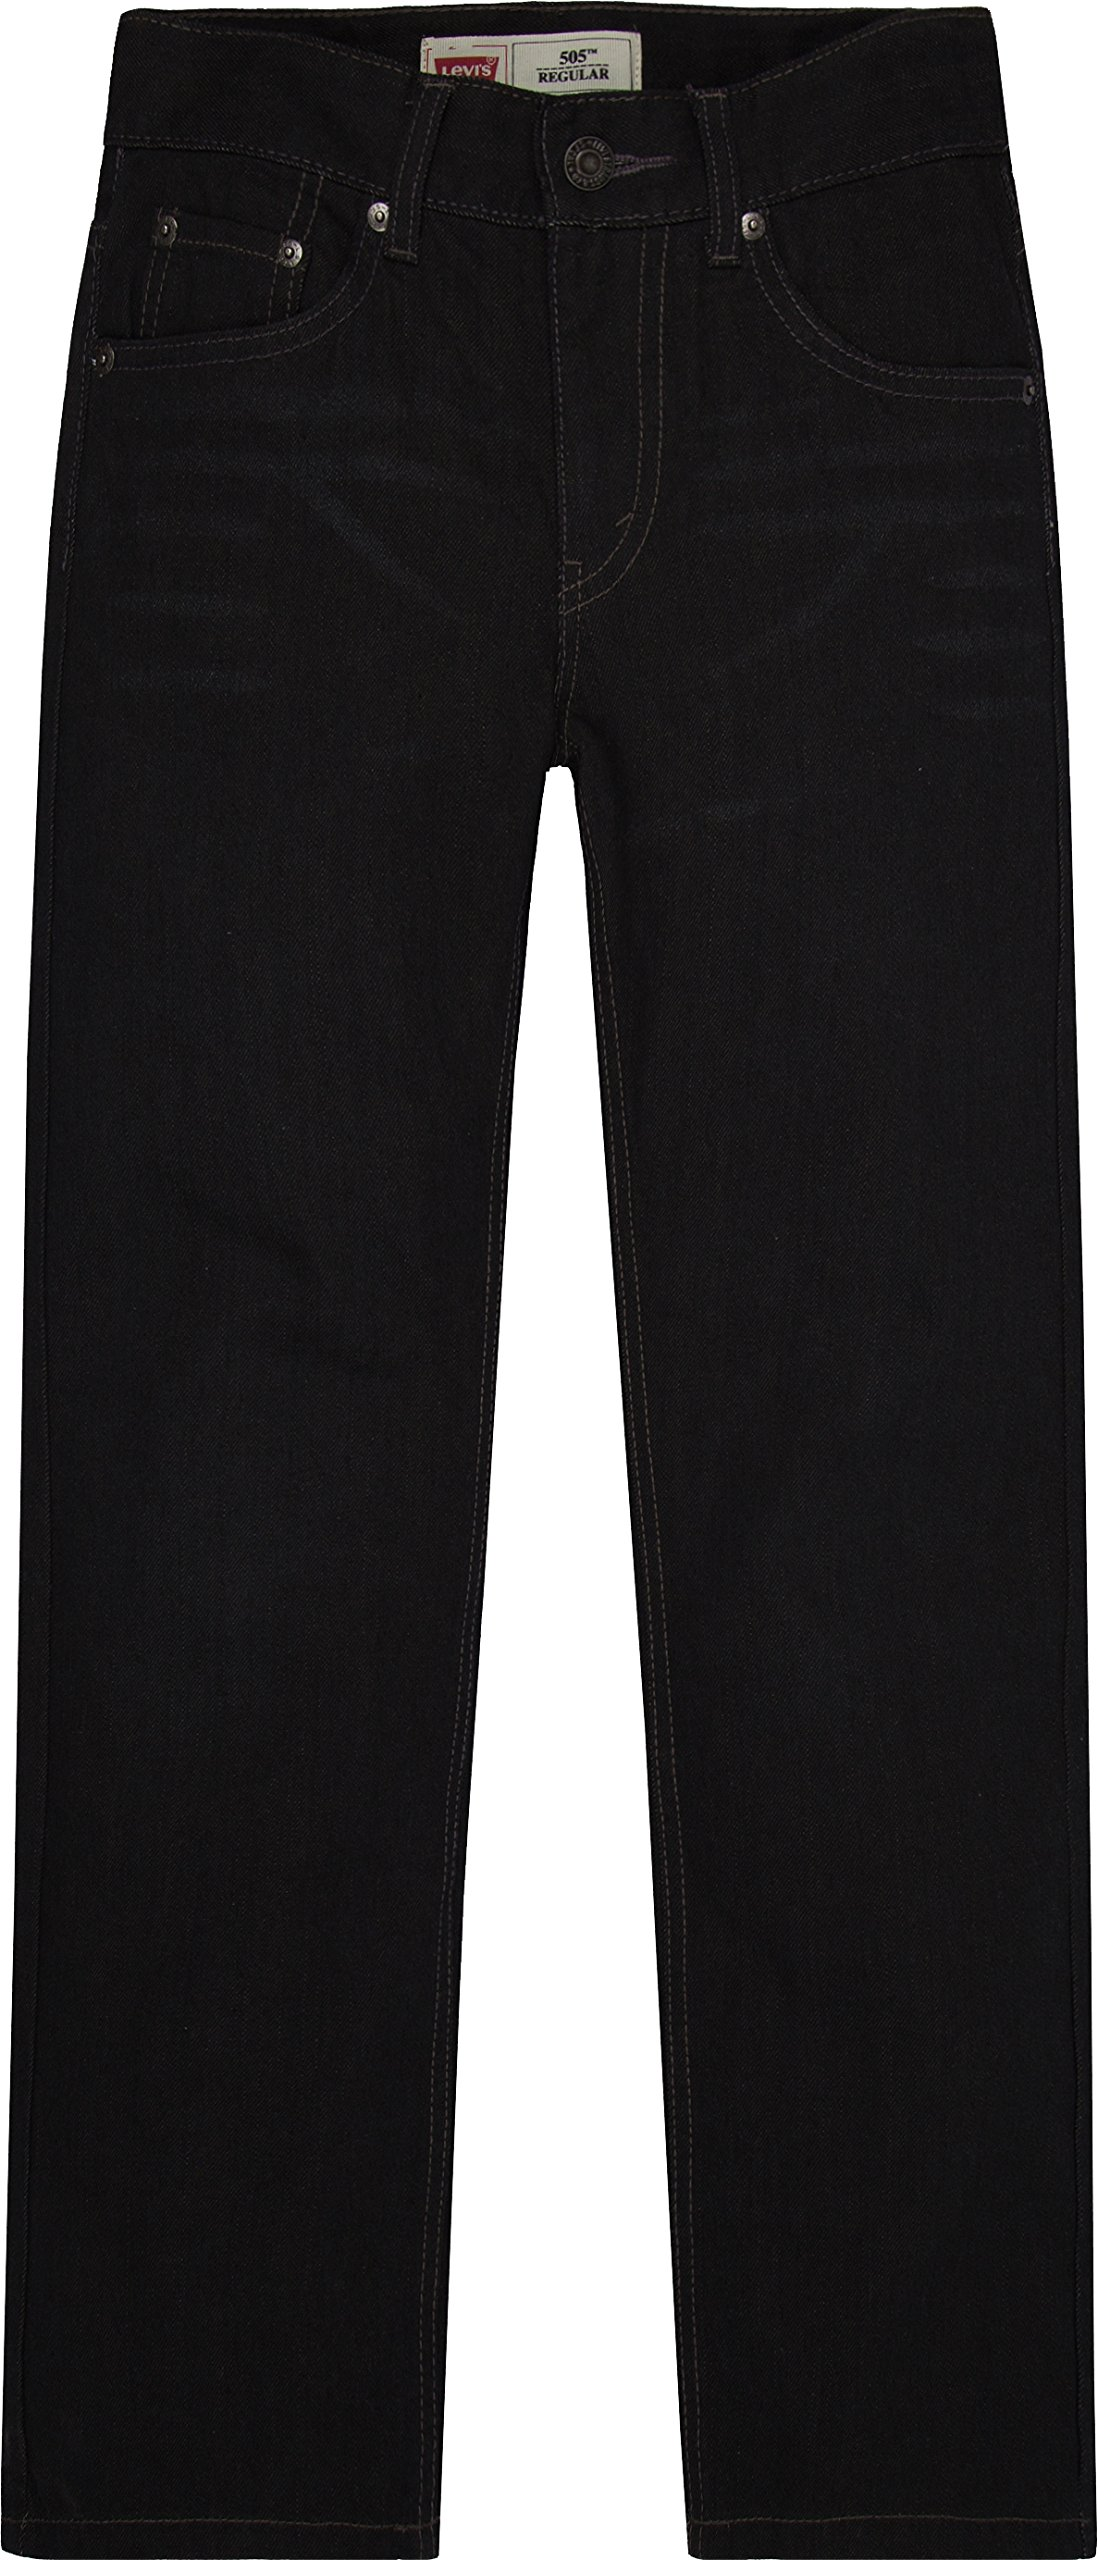 Levi's Boys' 505 Regular Fit Jeans, Levine, 12